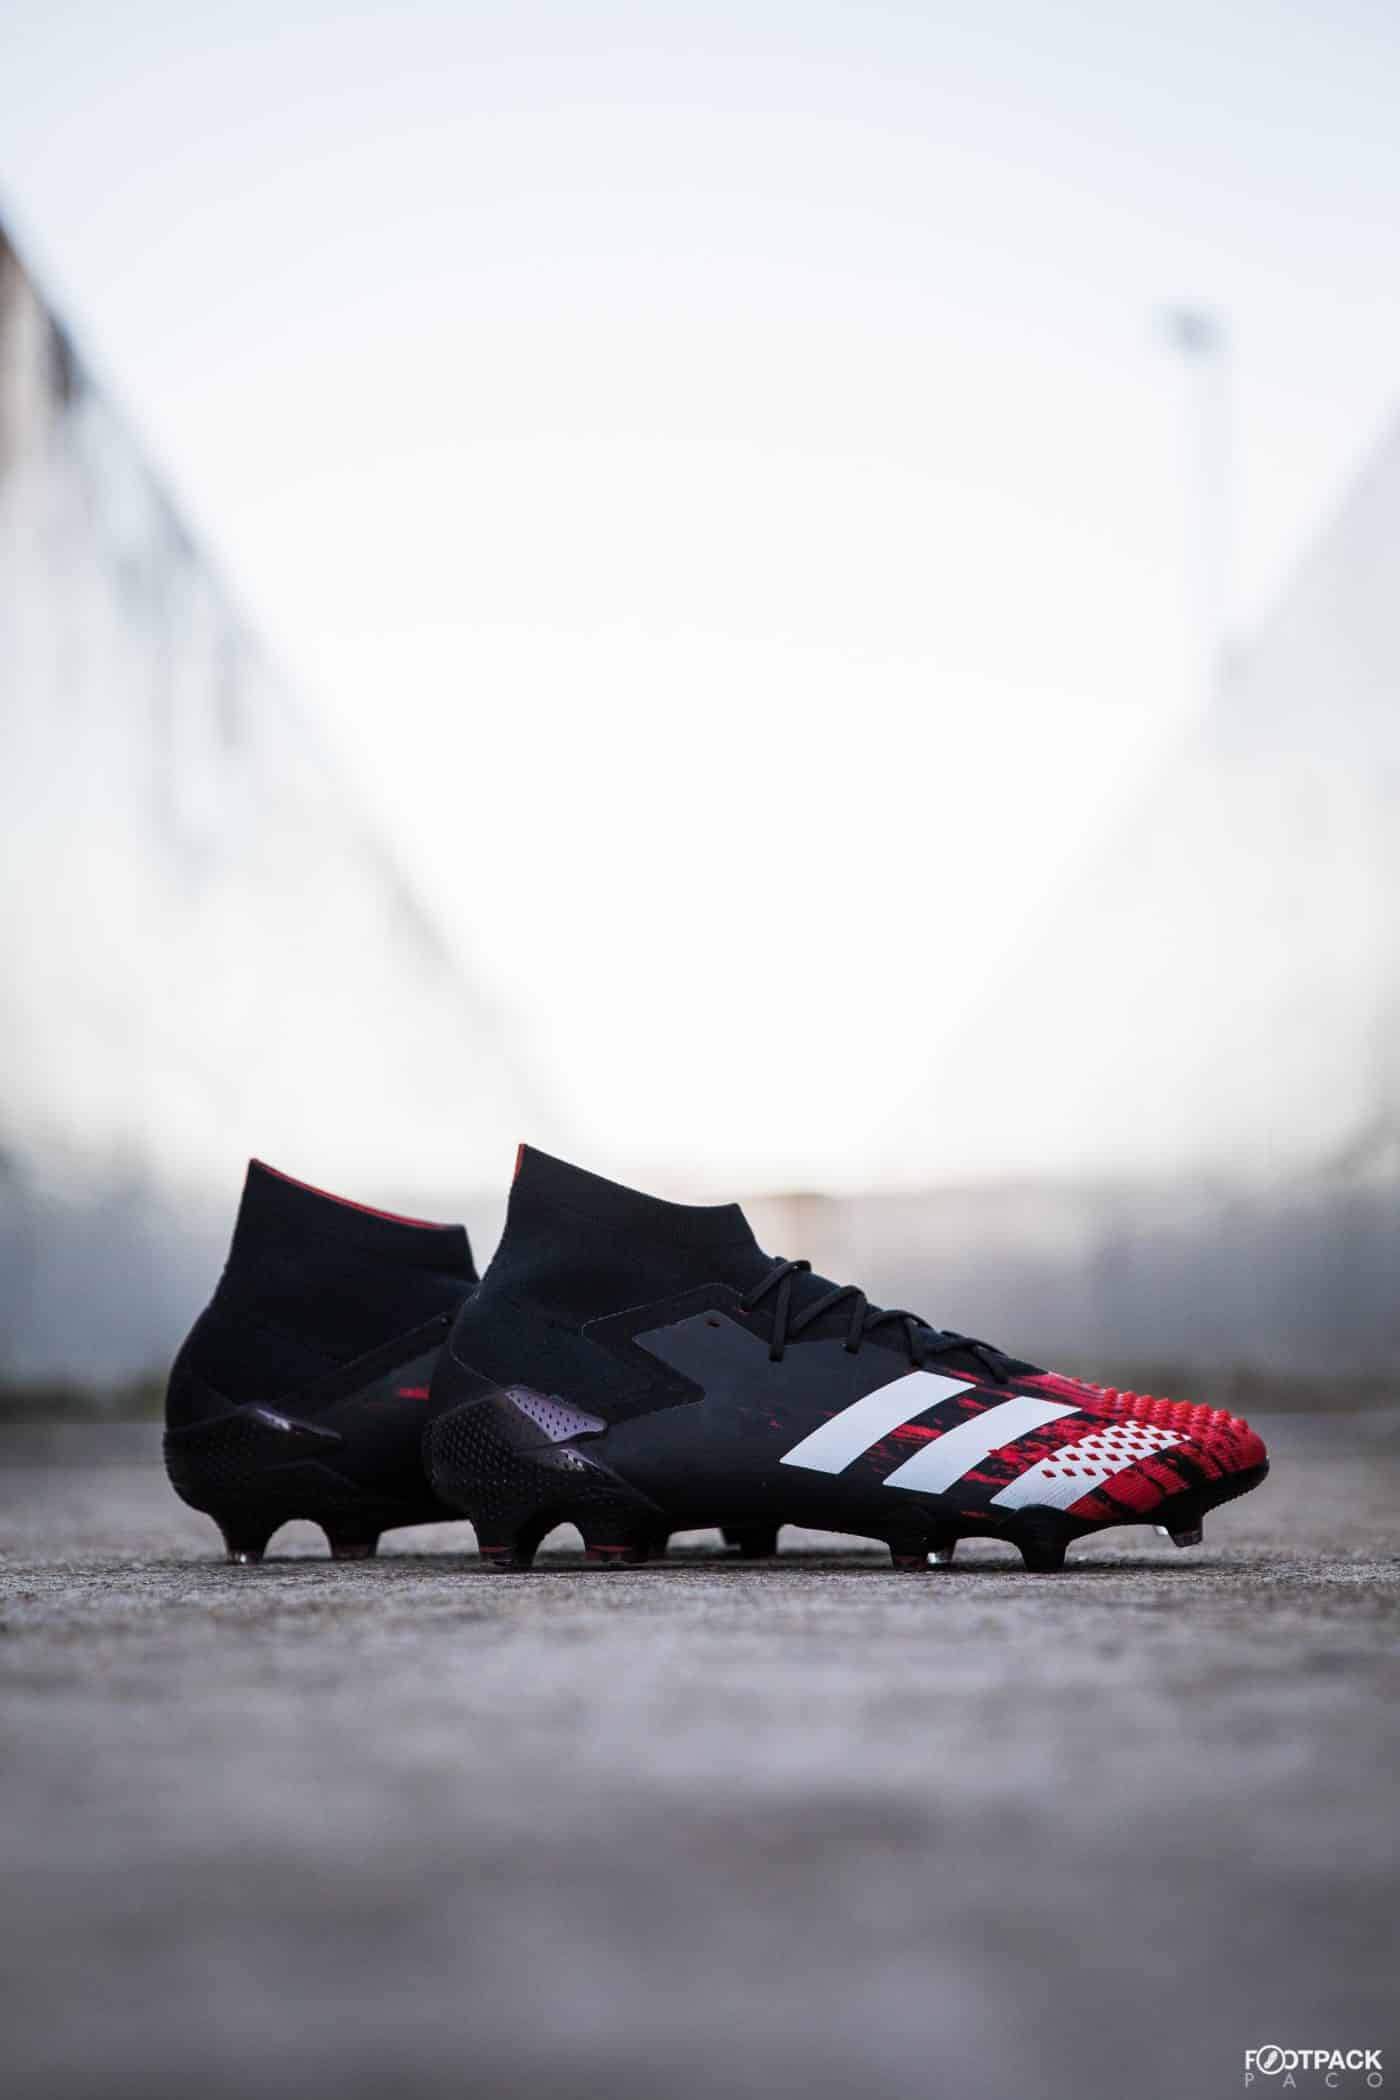 adidas-predator-20.1-mutator-footpack-3